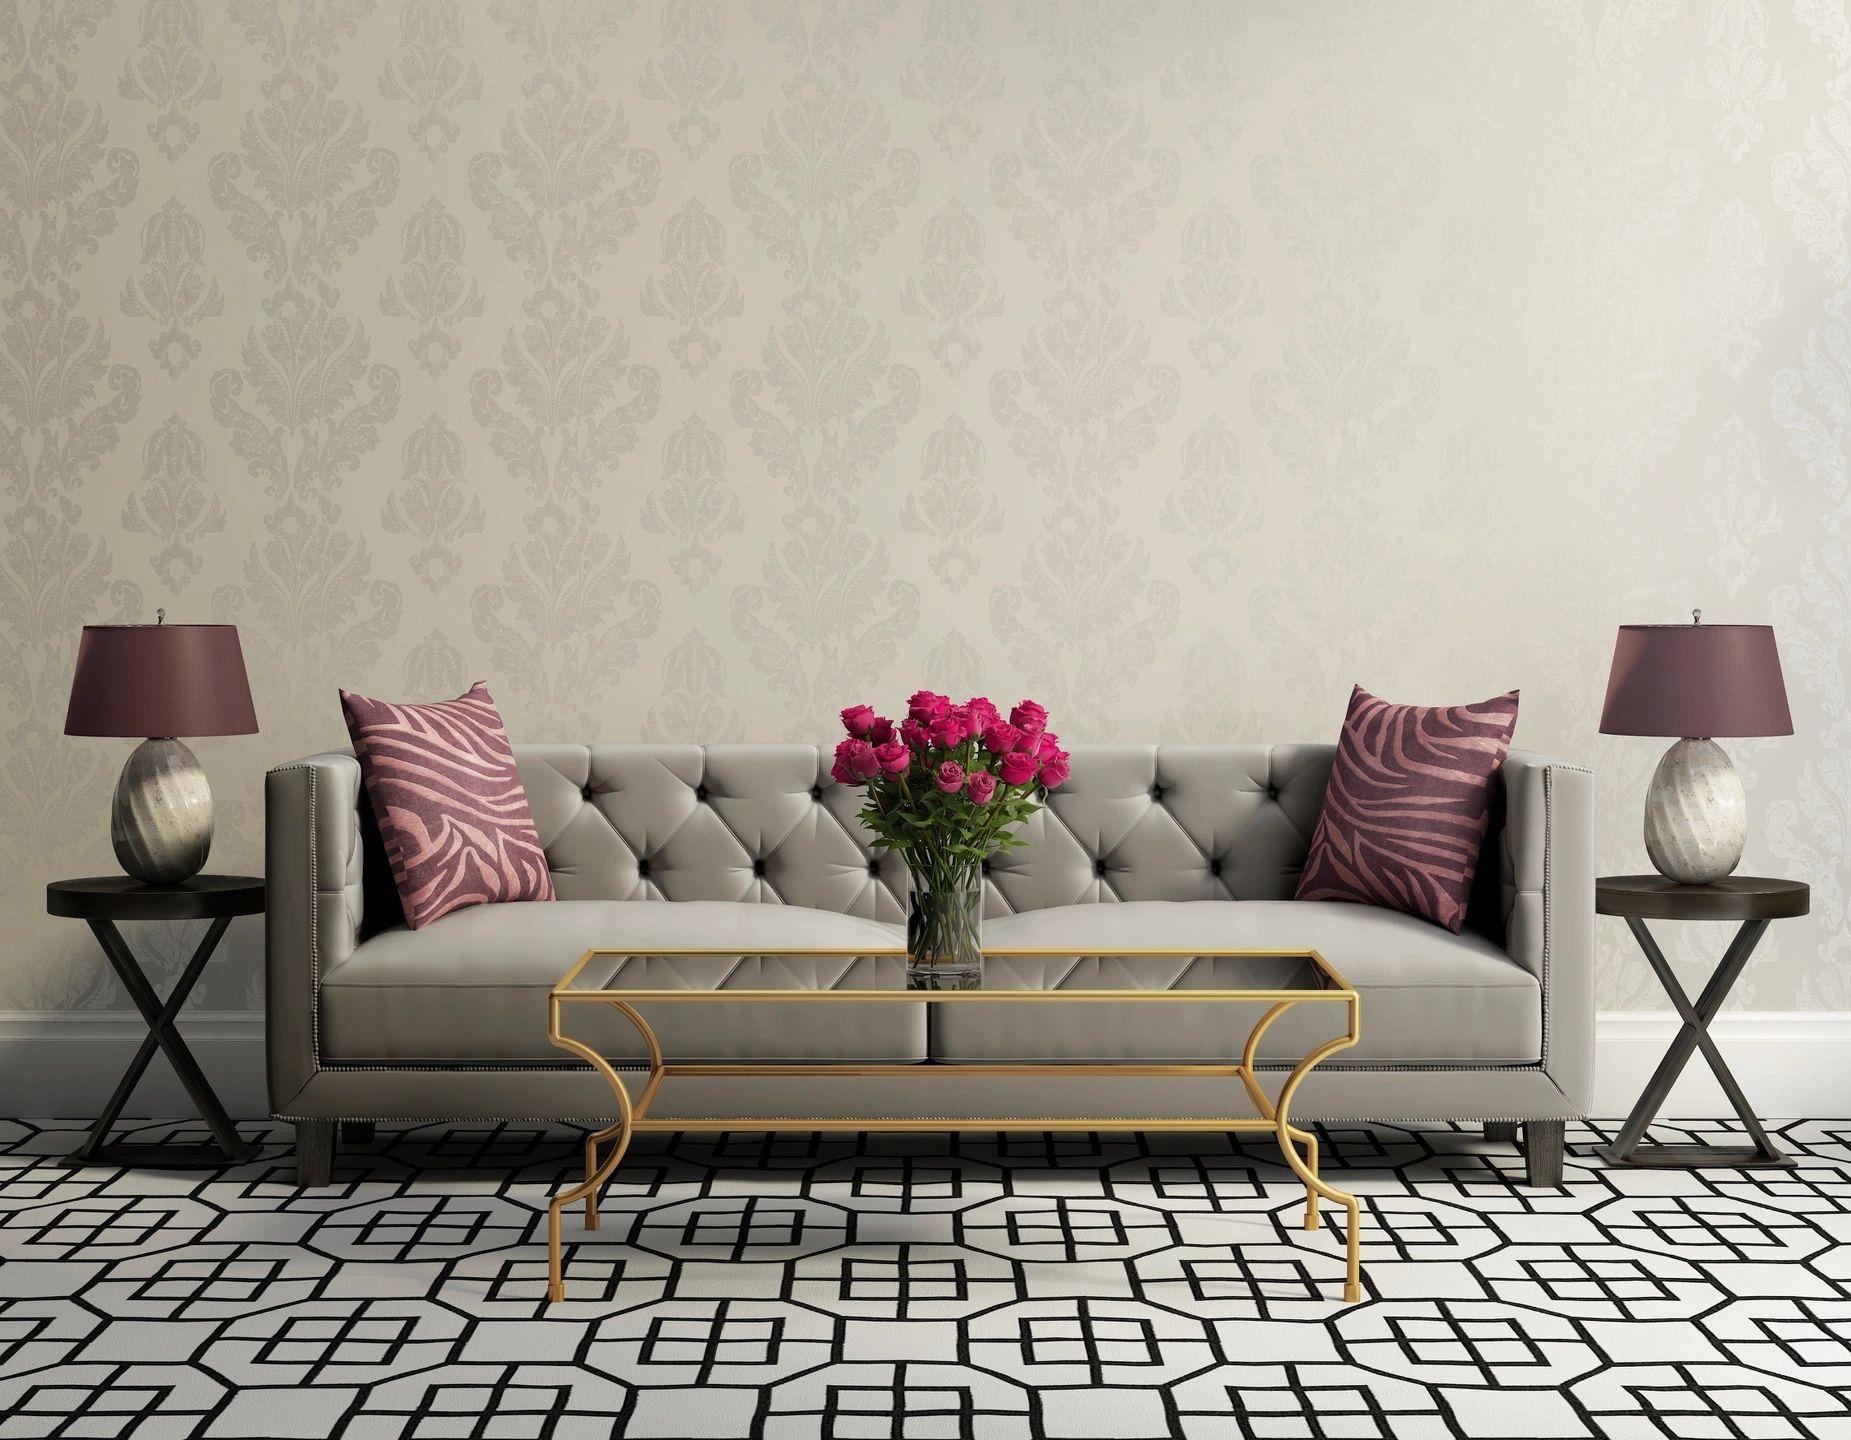 Excellent Payless Furniture Furniture Mattress Sofas Bedroom Dining Interior Design Ideas Tzicisoteloinfo